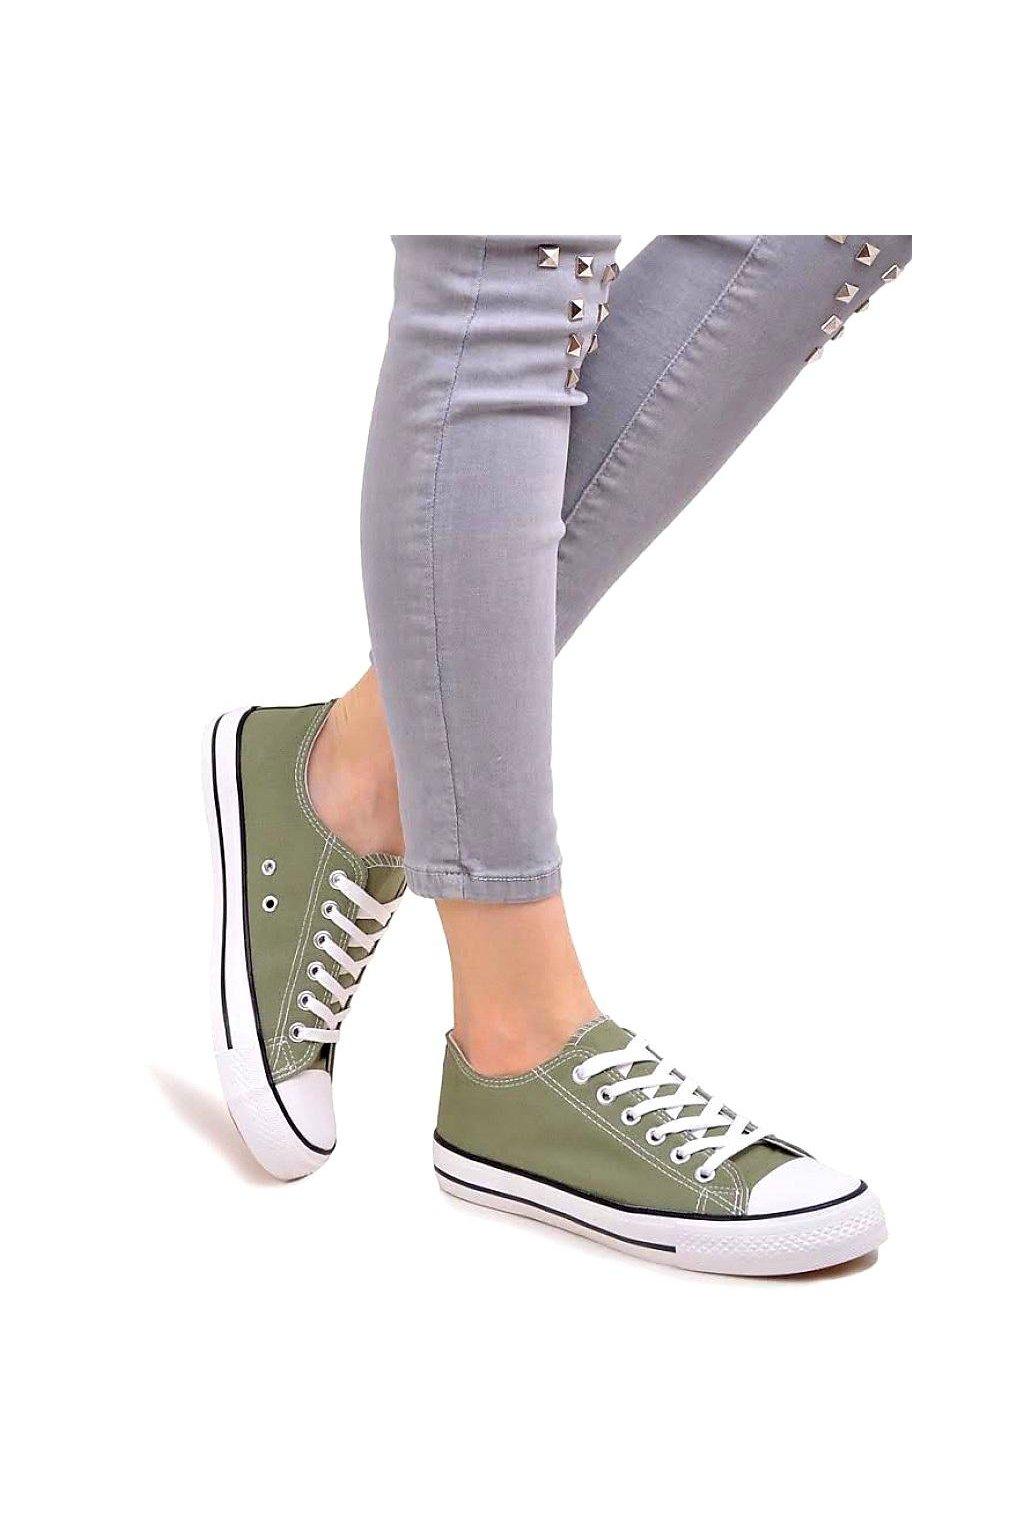 tenisky jersey plátěné convers khaki zelené